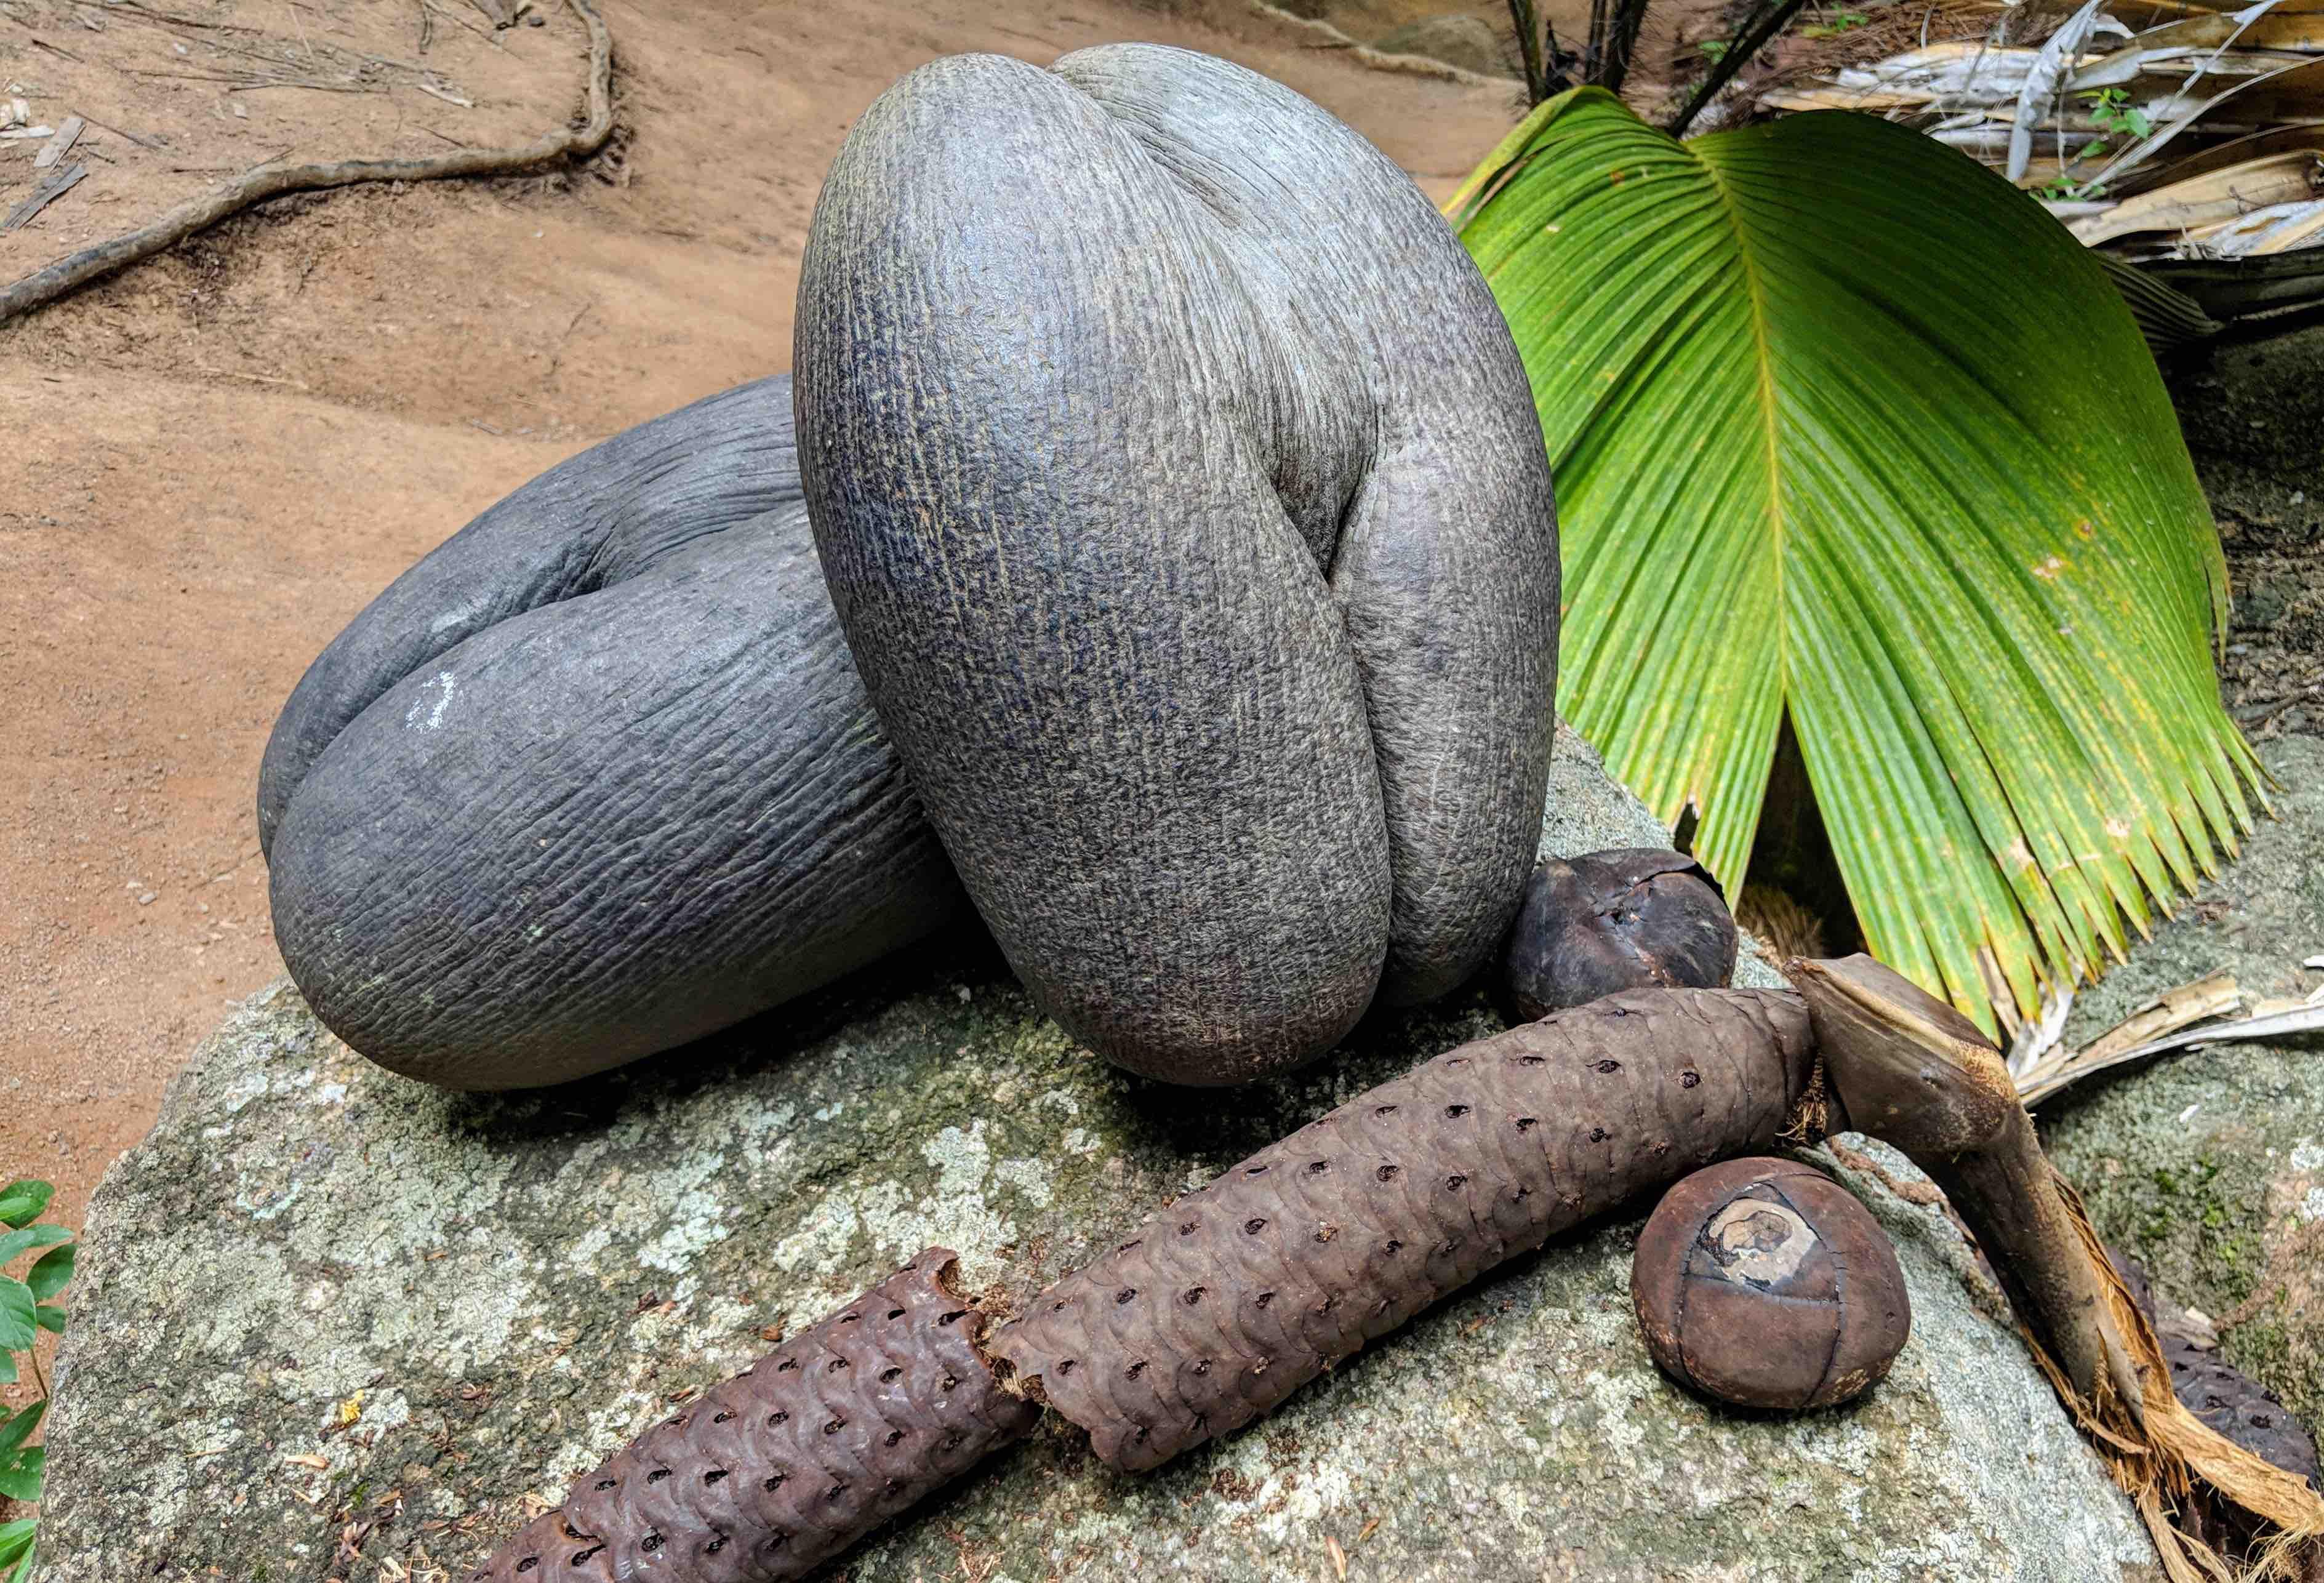 Coco de Mer Seychellem